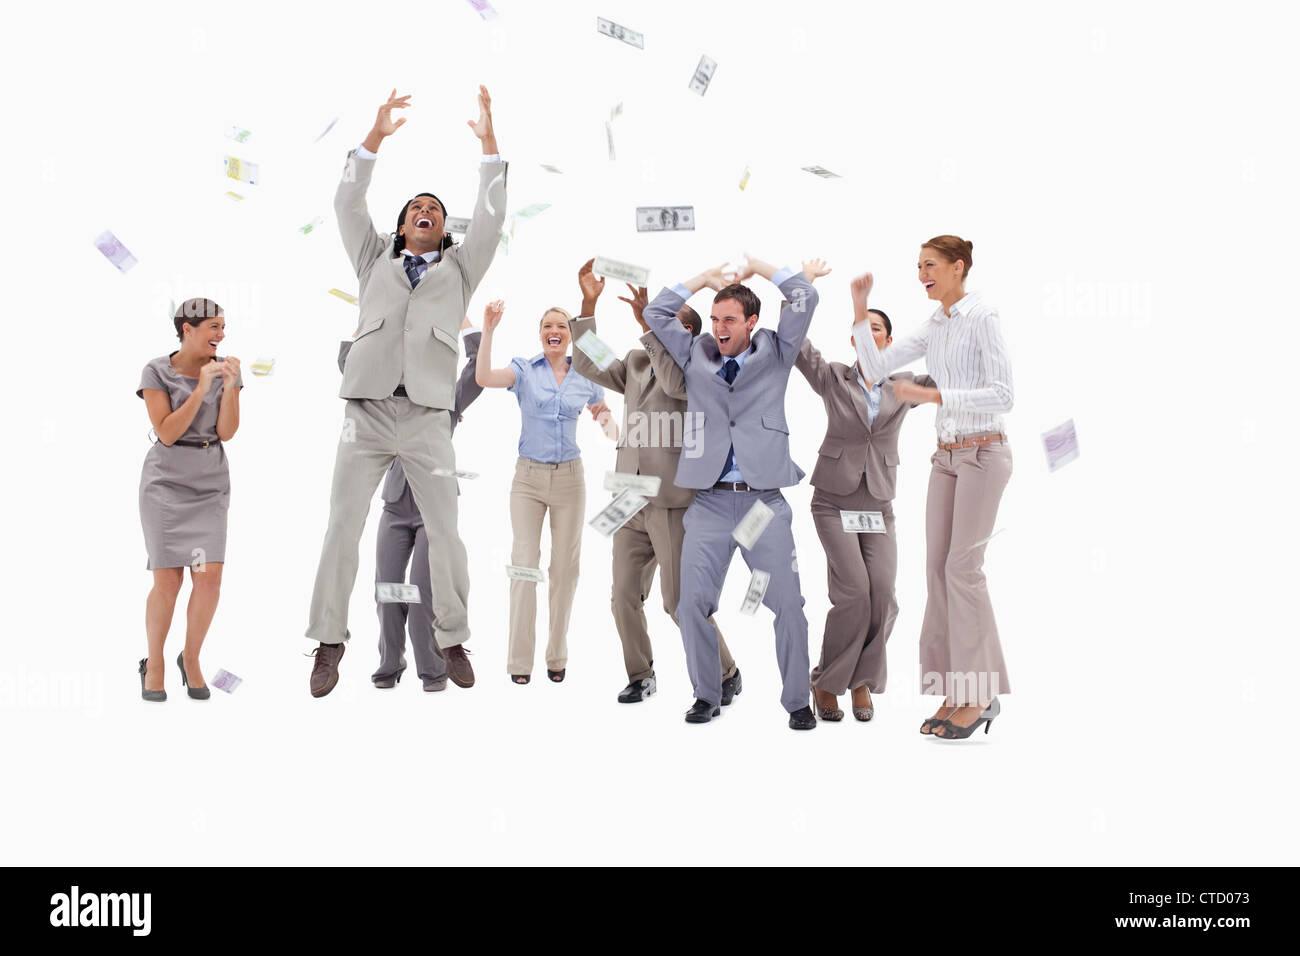 Très heureux les gens avec de l argent qui tombe du ciel Banque D ... a92ee843220